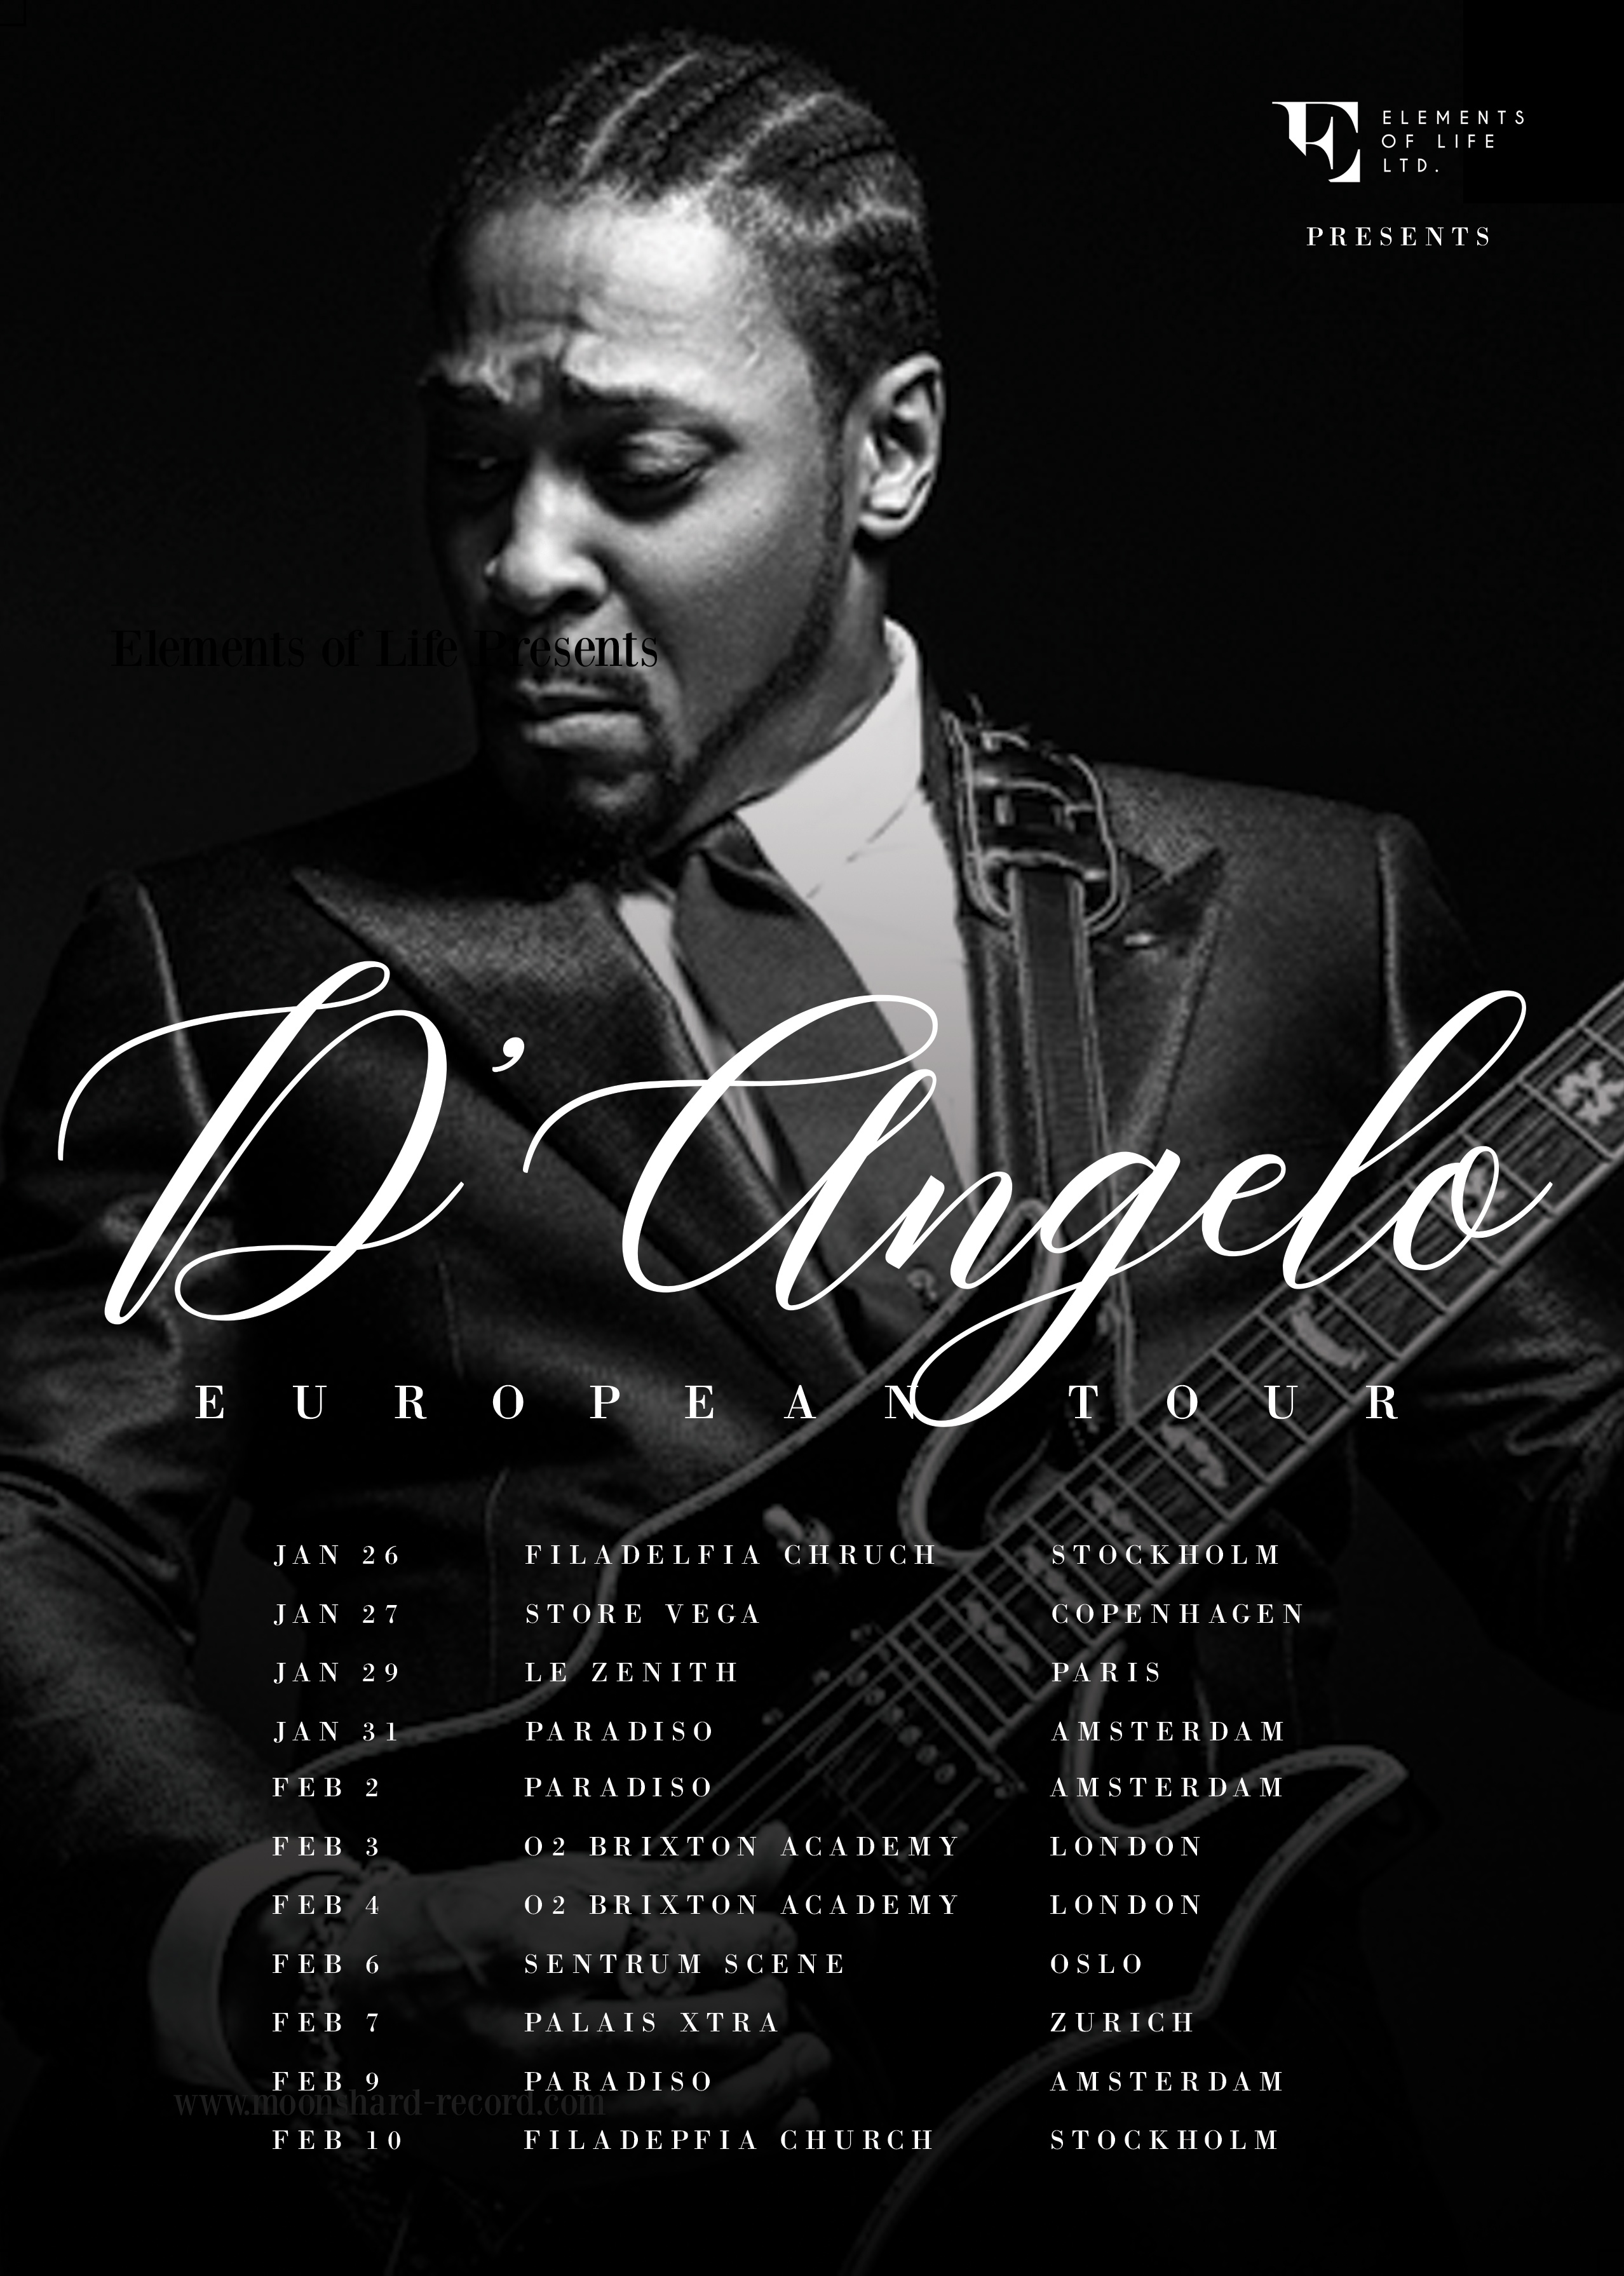 D'Angelo European Tour